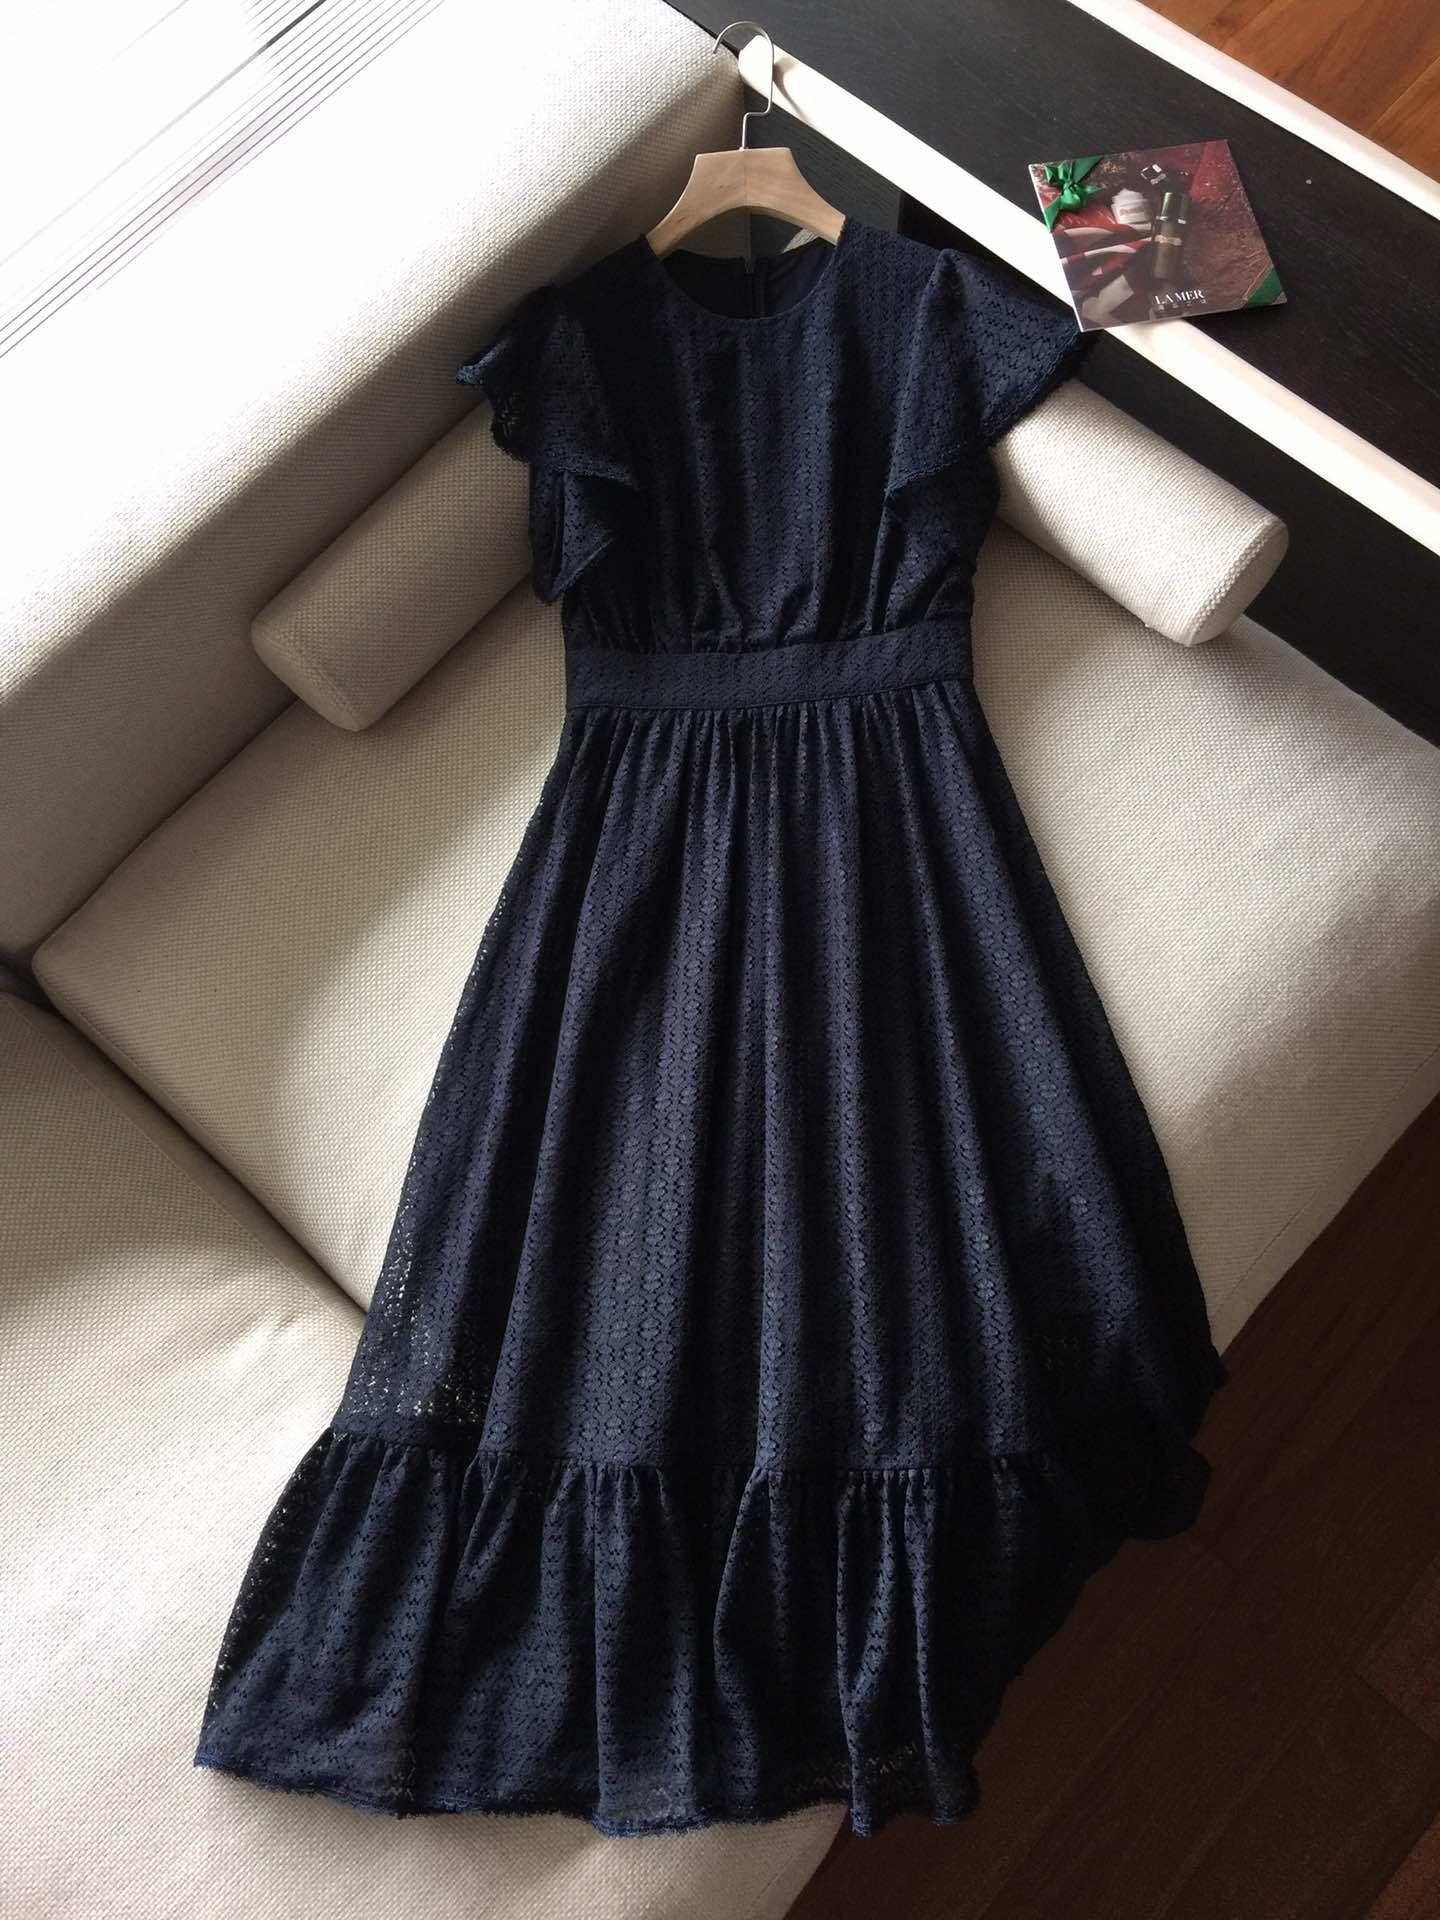 2019 New Fashion Stitching Ruffled Lace Luxury Dresses for Women Freeshipping